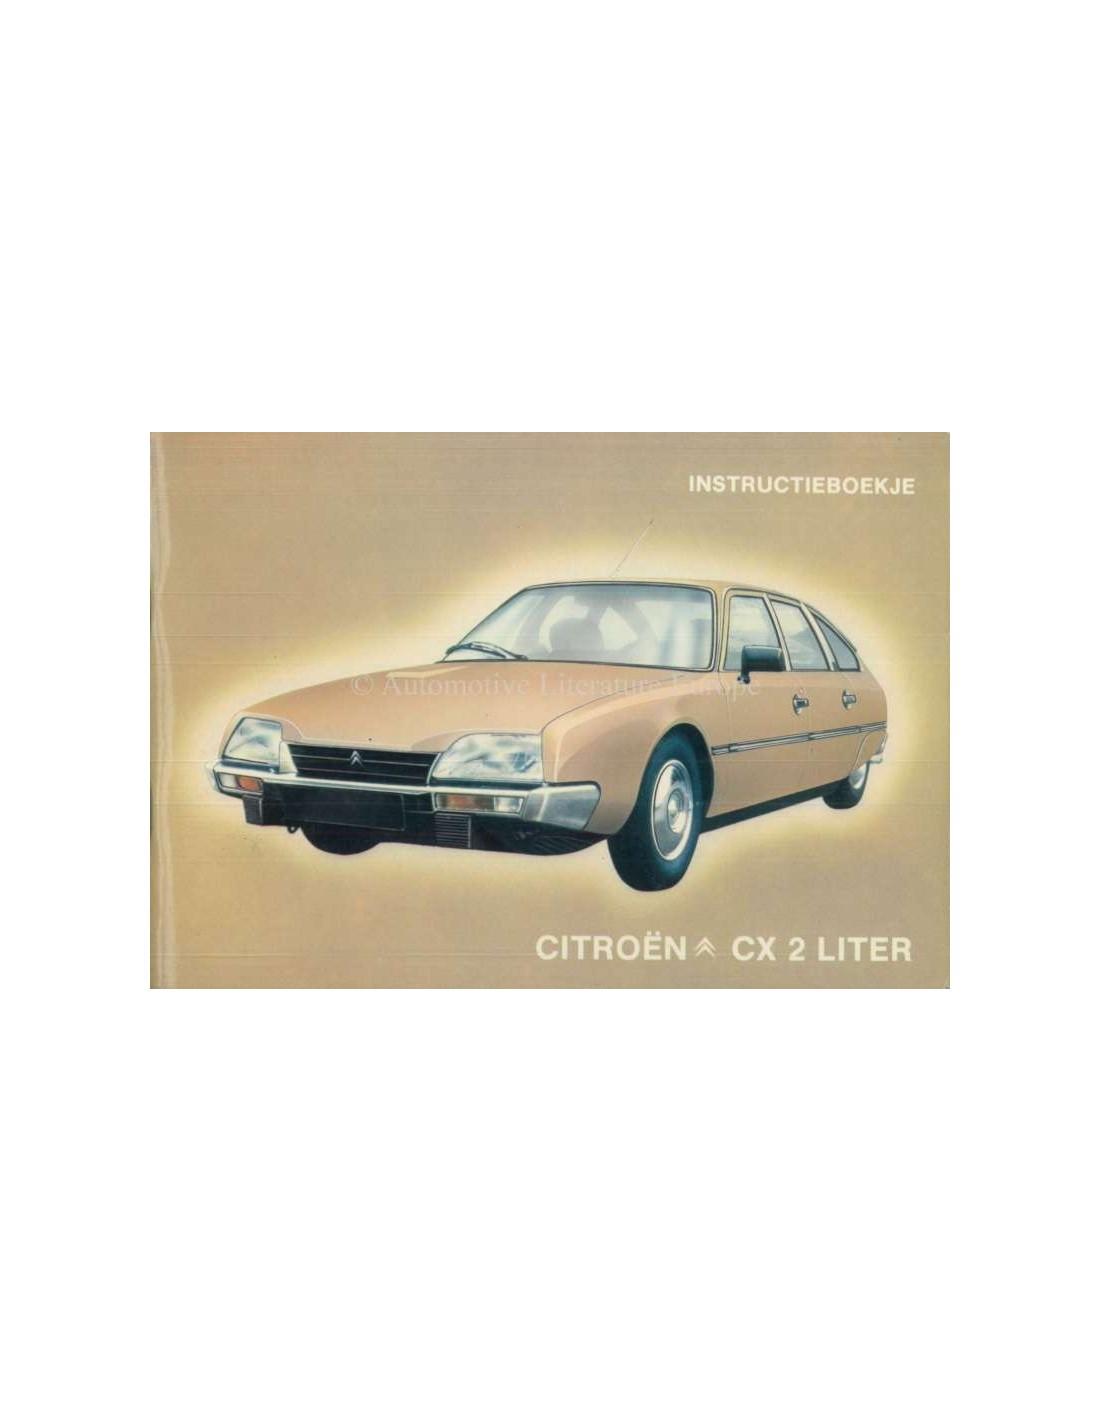 1981 citroen cx 2 litre owners manual dutch rh autolit eu Citroen BX citroen cx owners manual pdf